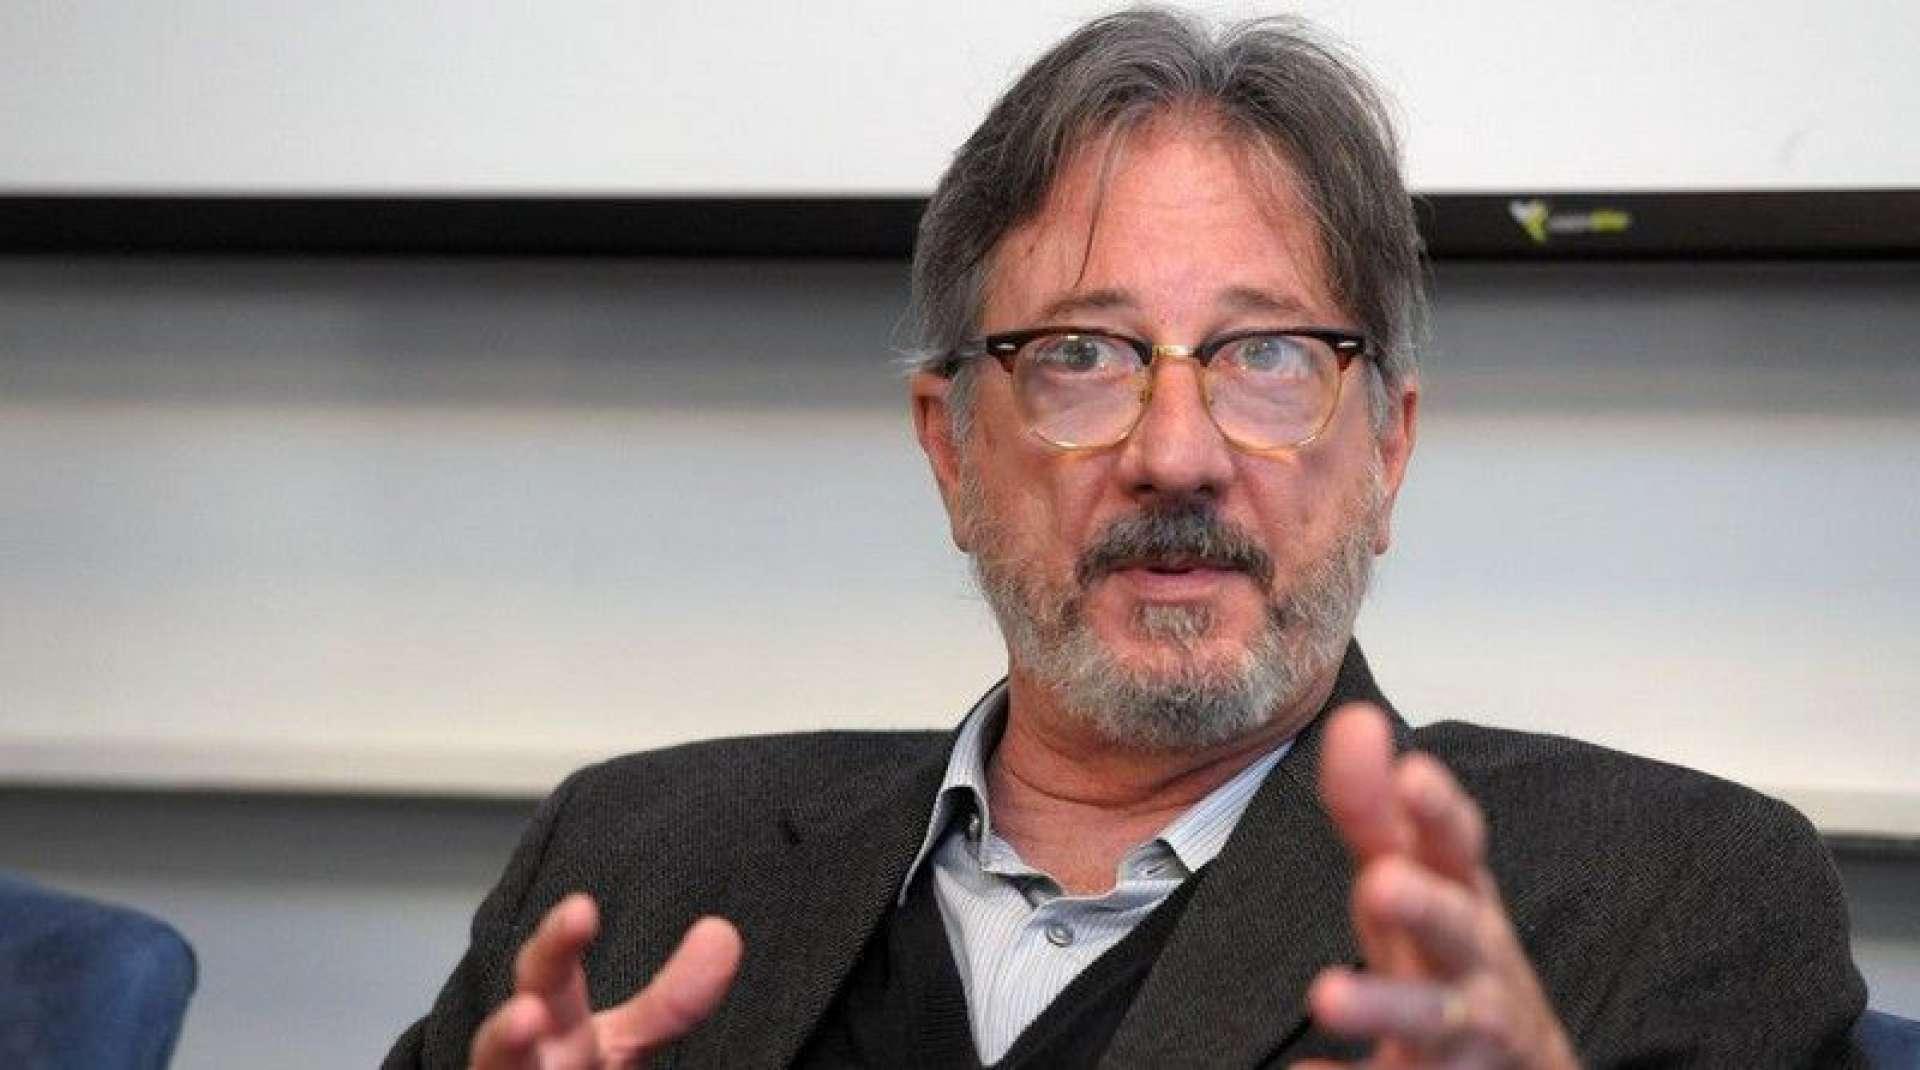 Presidente do Instituto Ethos, Caio Magri